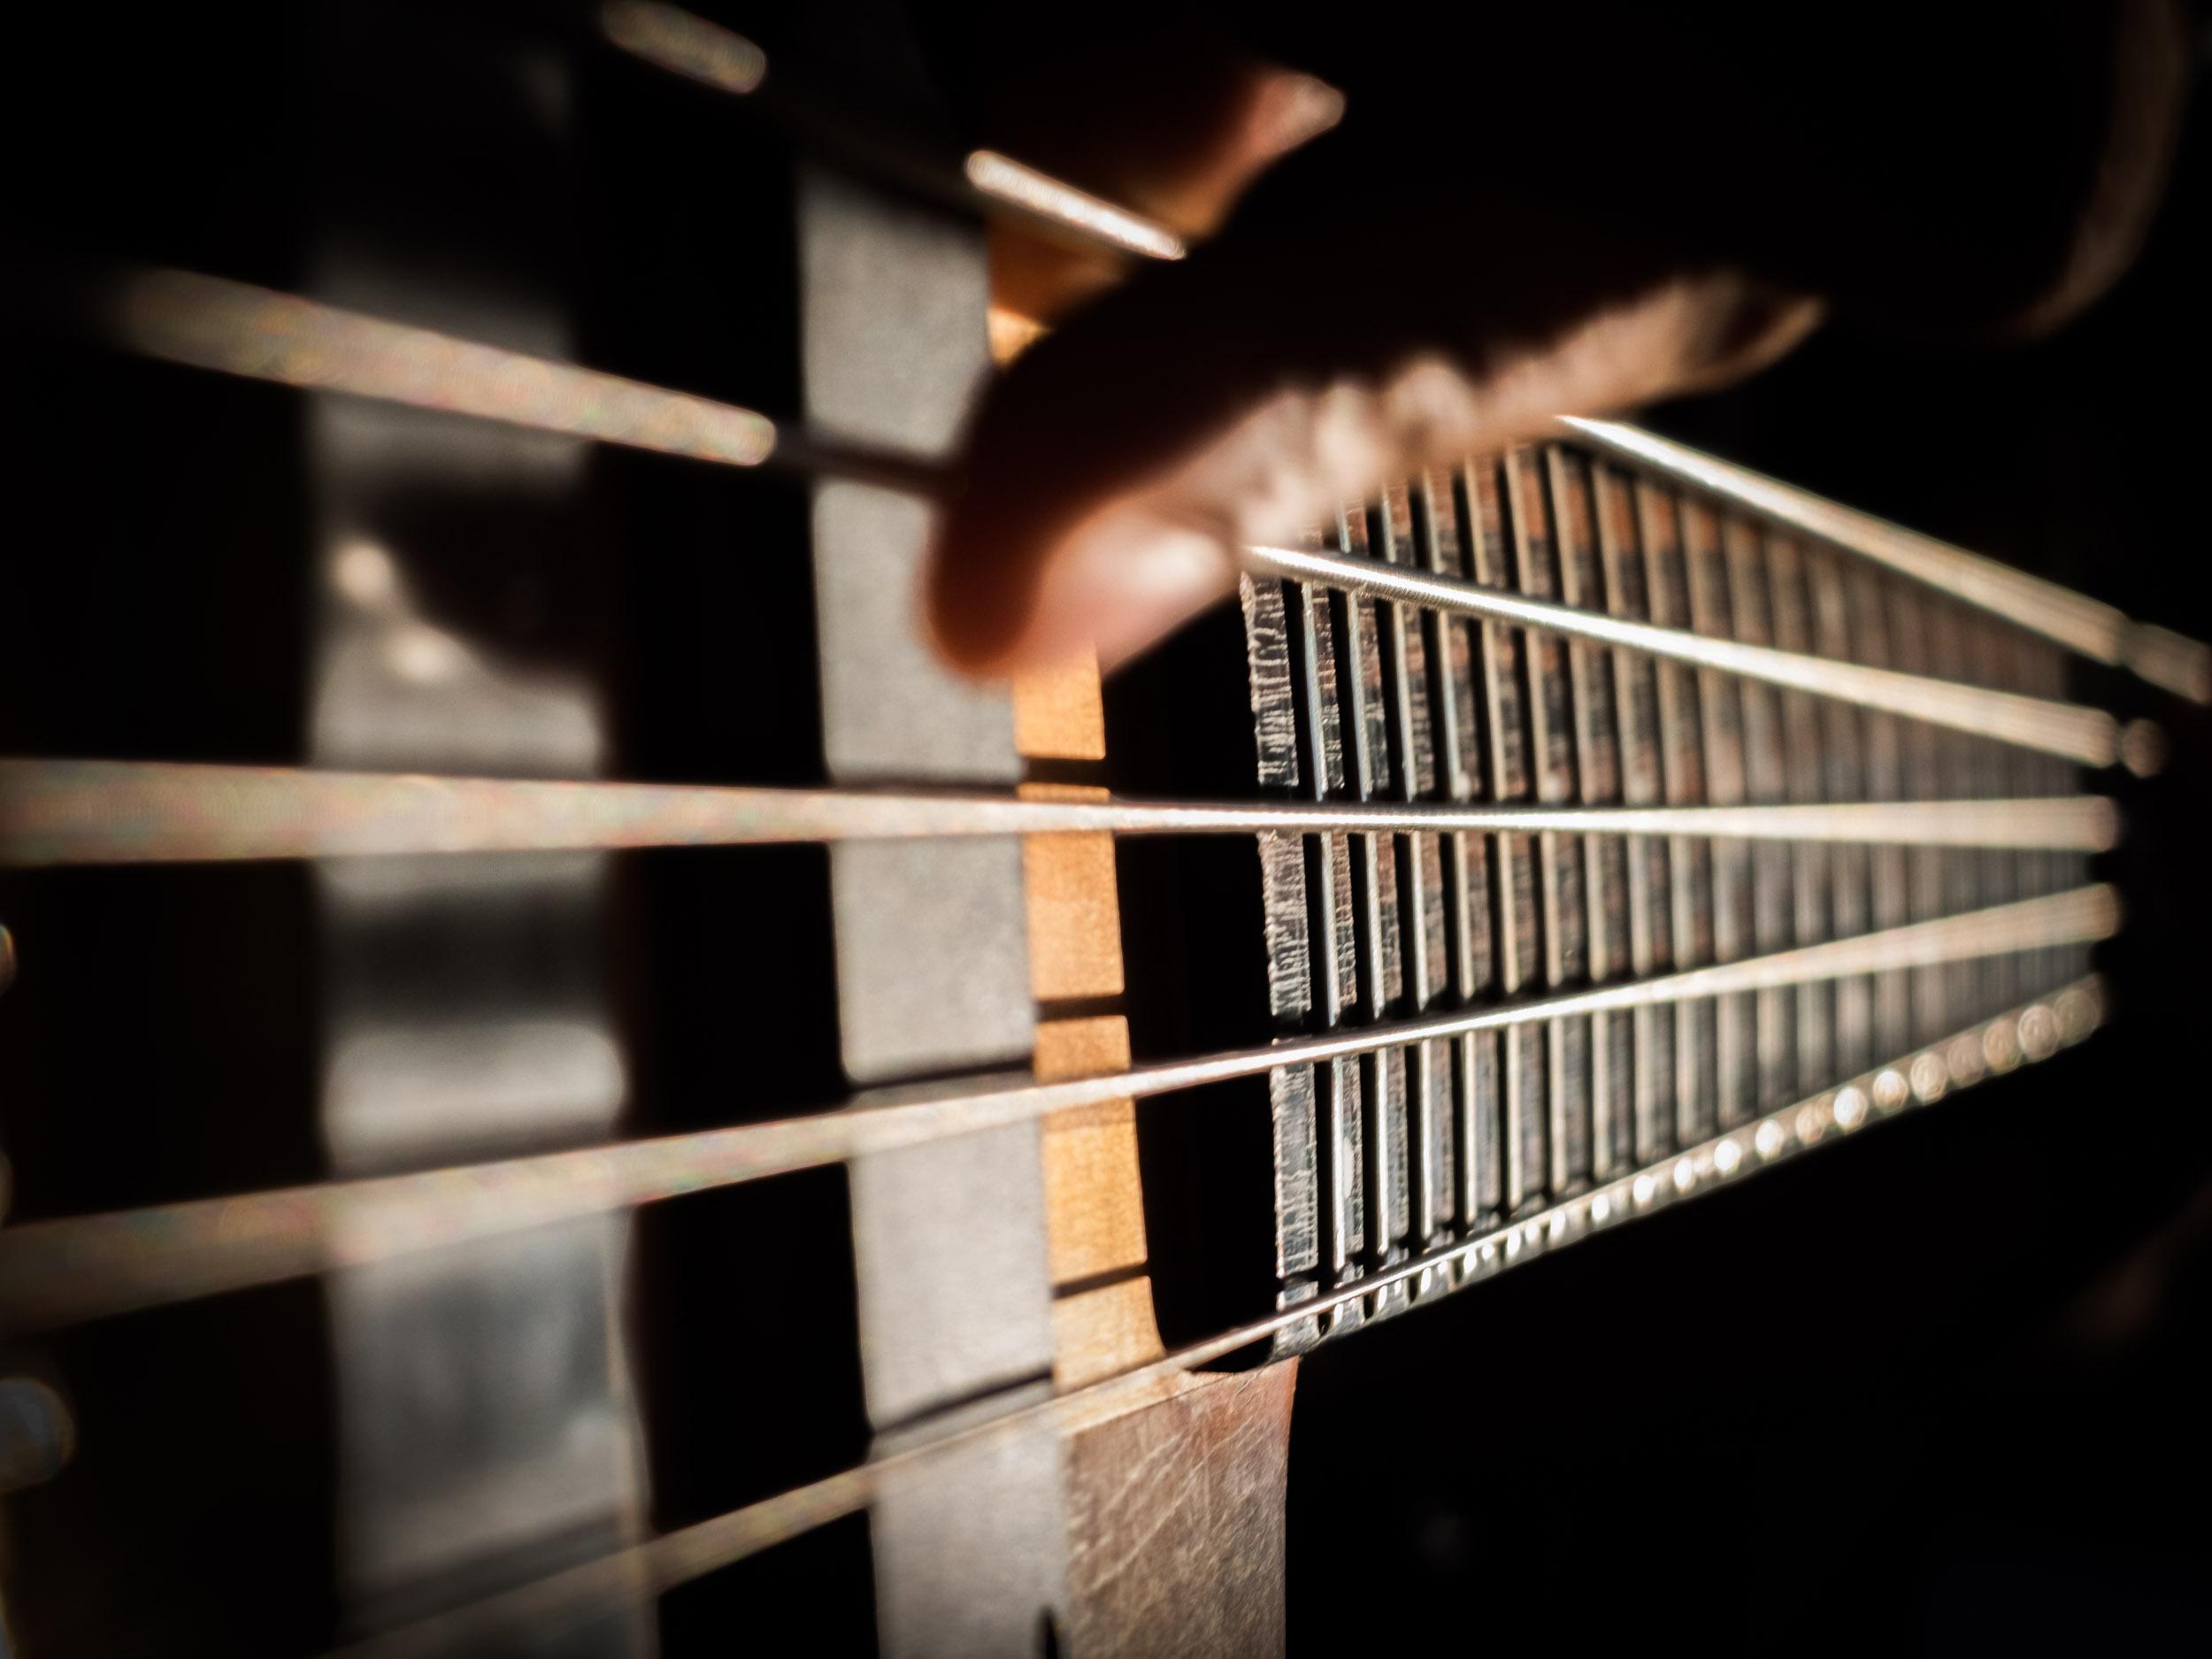 music photography courses sydney-1.jpg